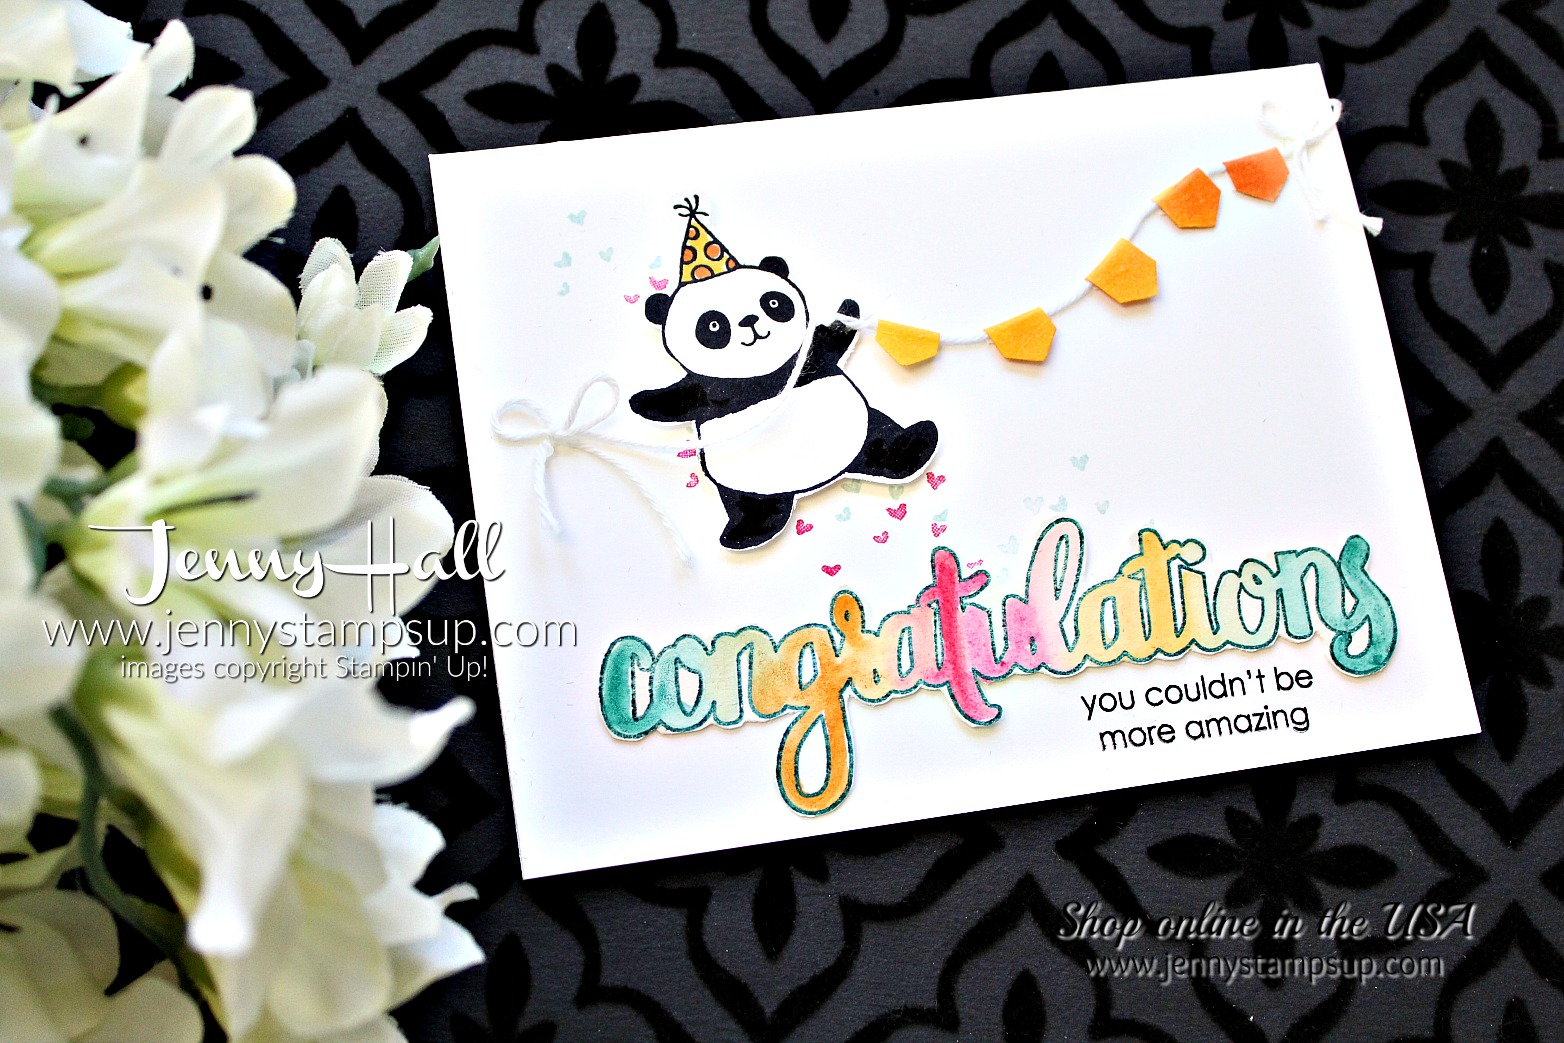 OSAT Blog Hop card with Party Pandas stamp set by Jenny Hallat www.jennystampsup.com for #cardmaking #stampinup #bloghop #jennyhall #jennyhalldesign #jennyhallstampinup #partypandas #celebrate #videotutorial #cardmakingvideo